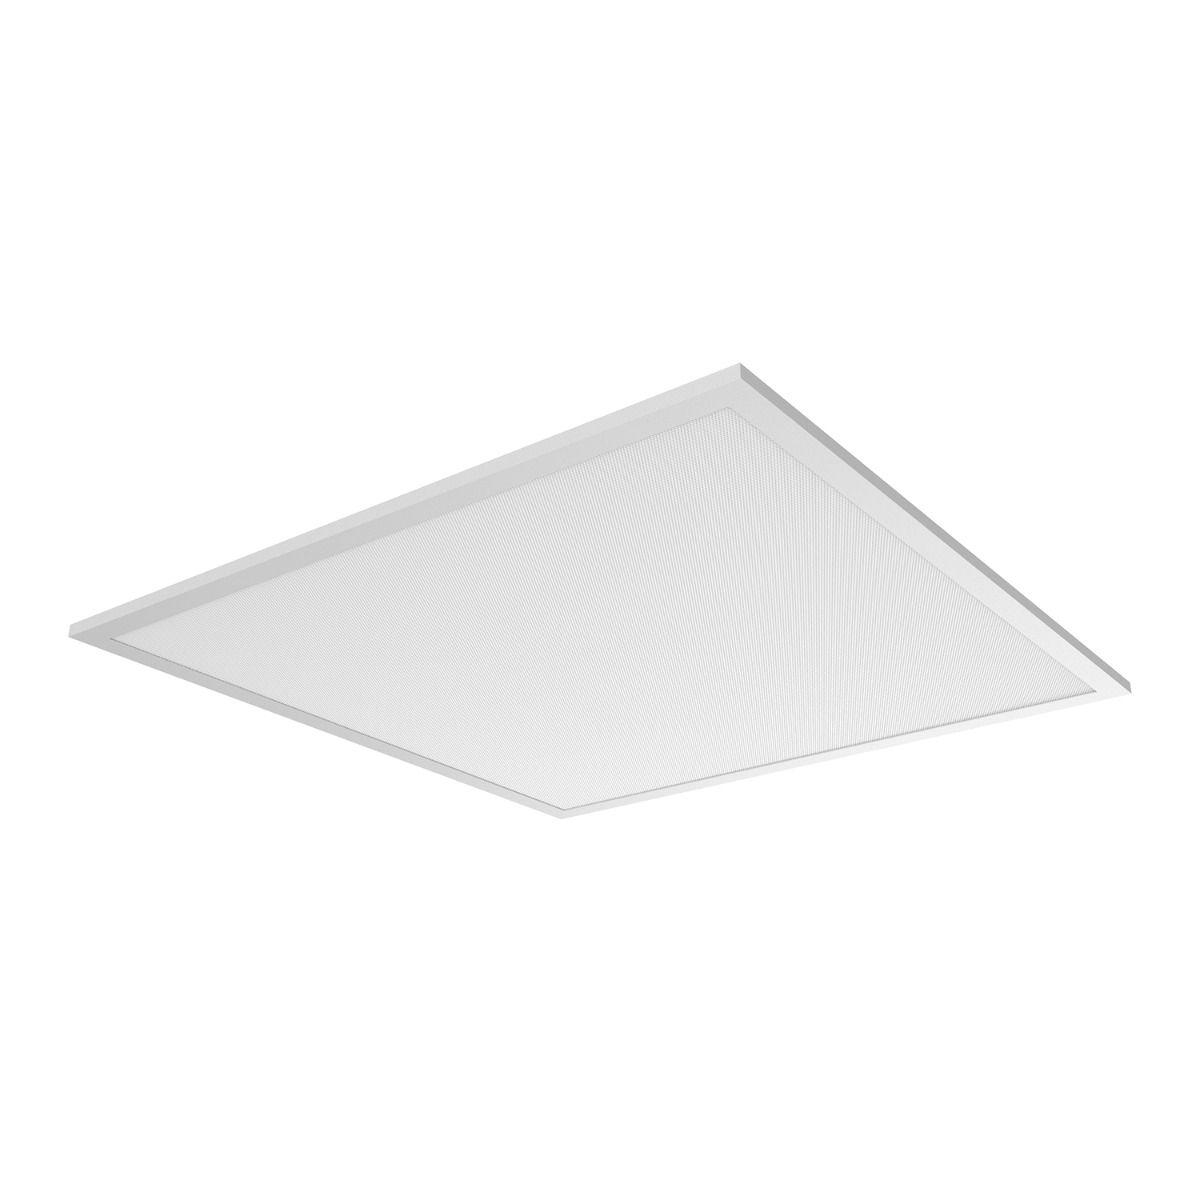 Noxion LED Panel Delta Pro V3 Highlum DALI 36W 4000K 5500lm 60x60cm UGR <19   Cool White - Replaces 4x18W